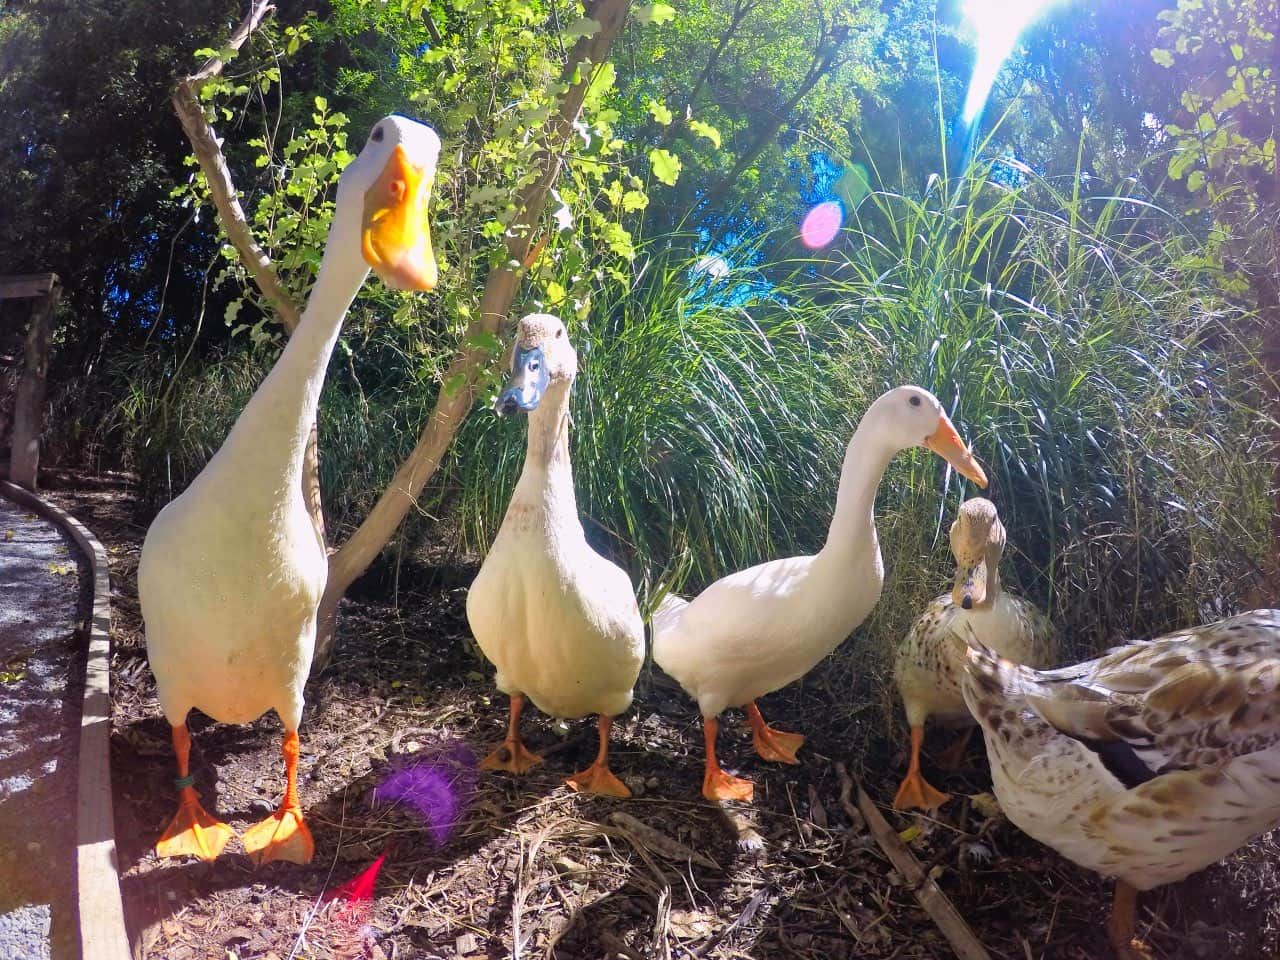 Willowbank-Wildlife-PArk-Chistchurch-look-a-camera